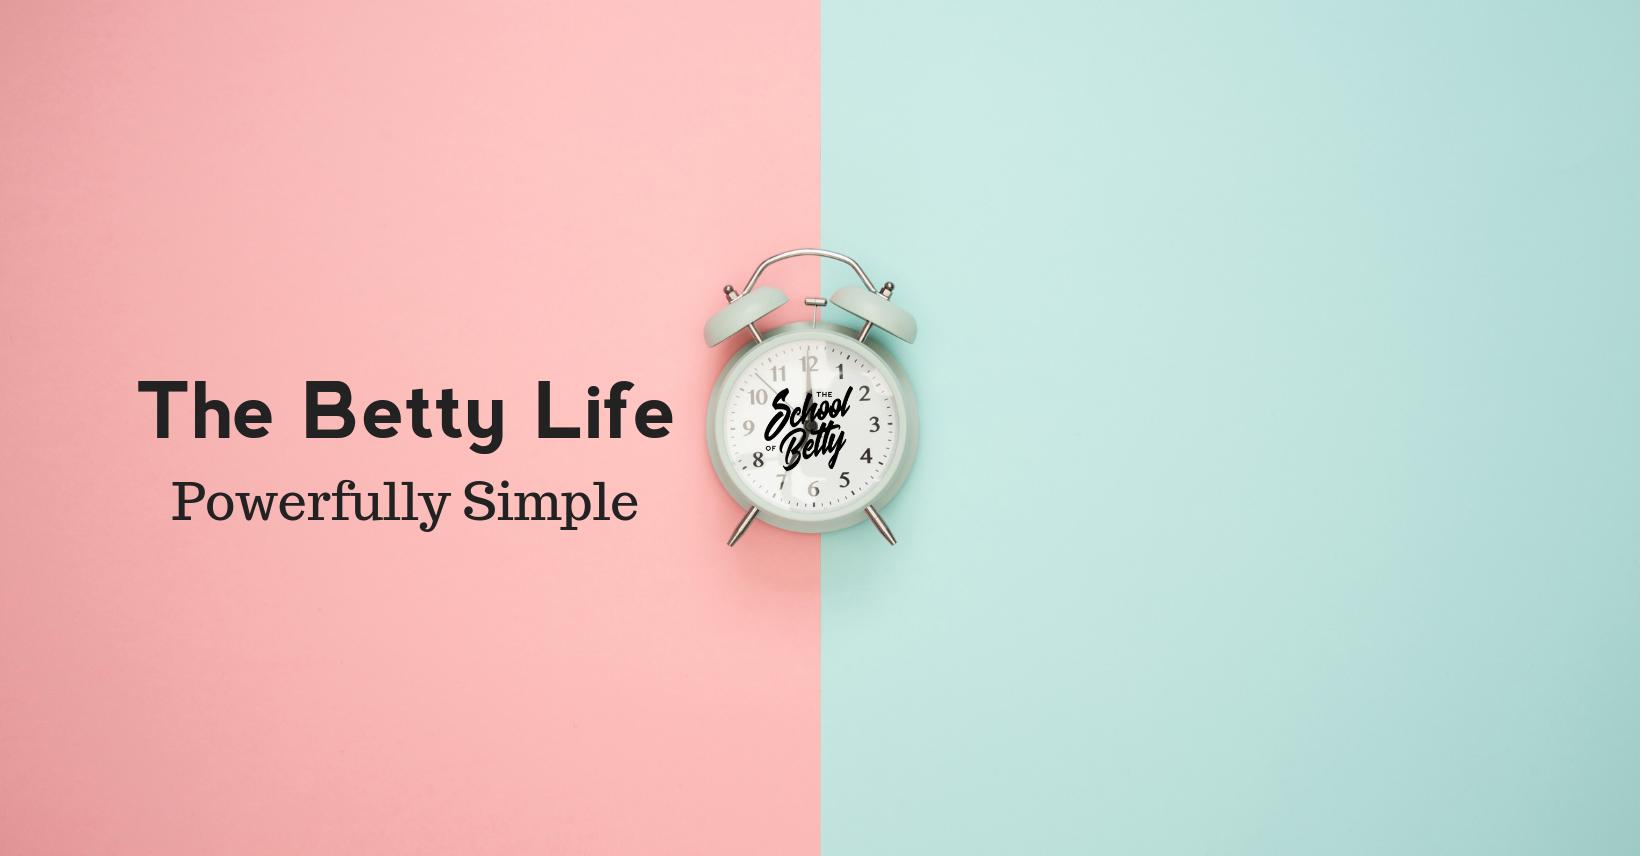 Copy of THE BETT LIFE_KAJABI MEMBERSHIP SITE header_POWERFULLY SIMPLE clock PINK fb (2).png